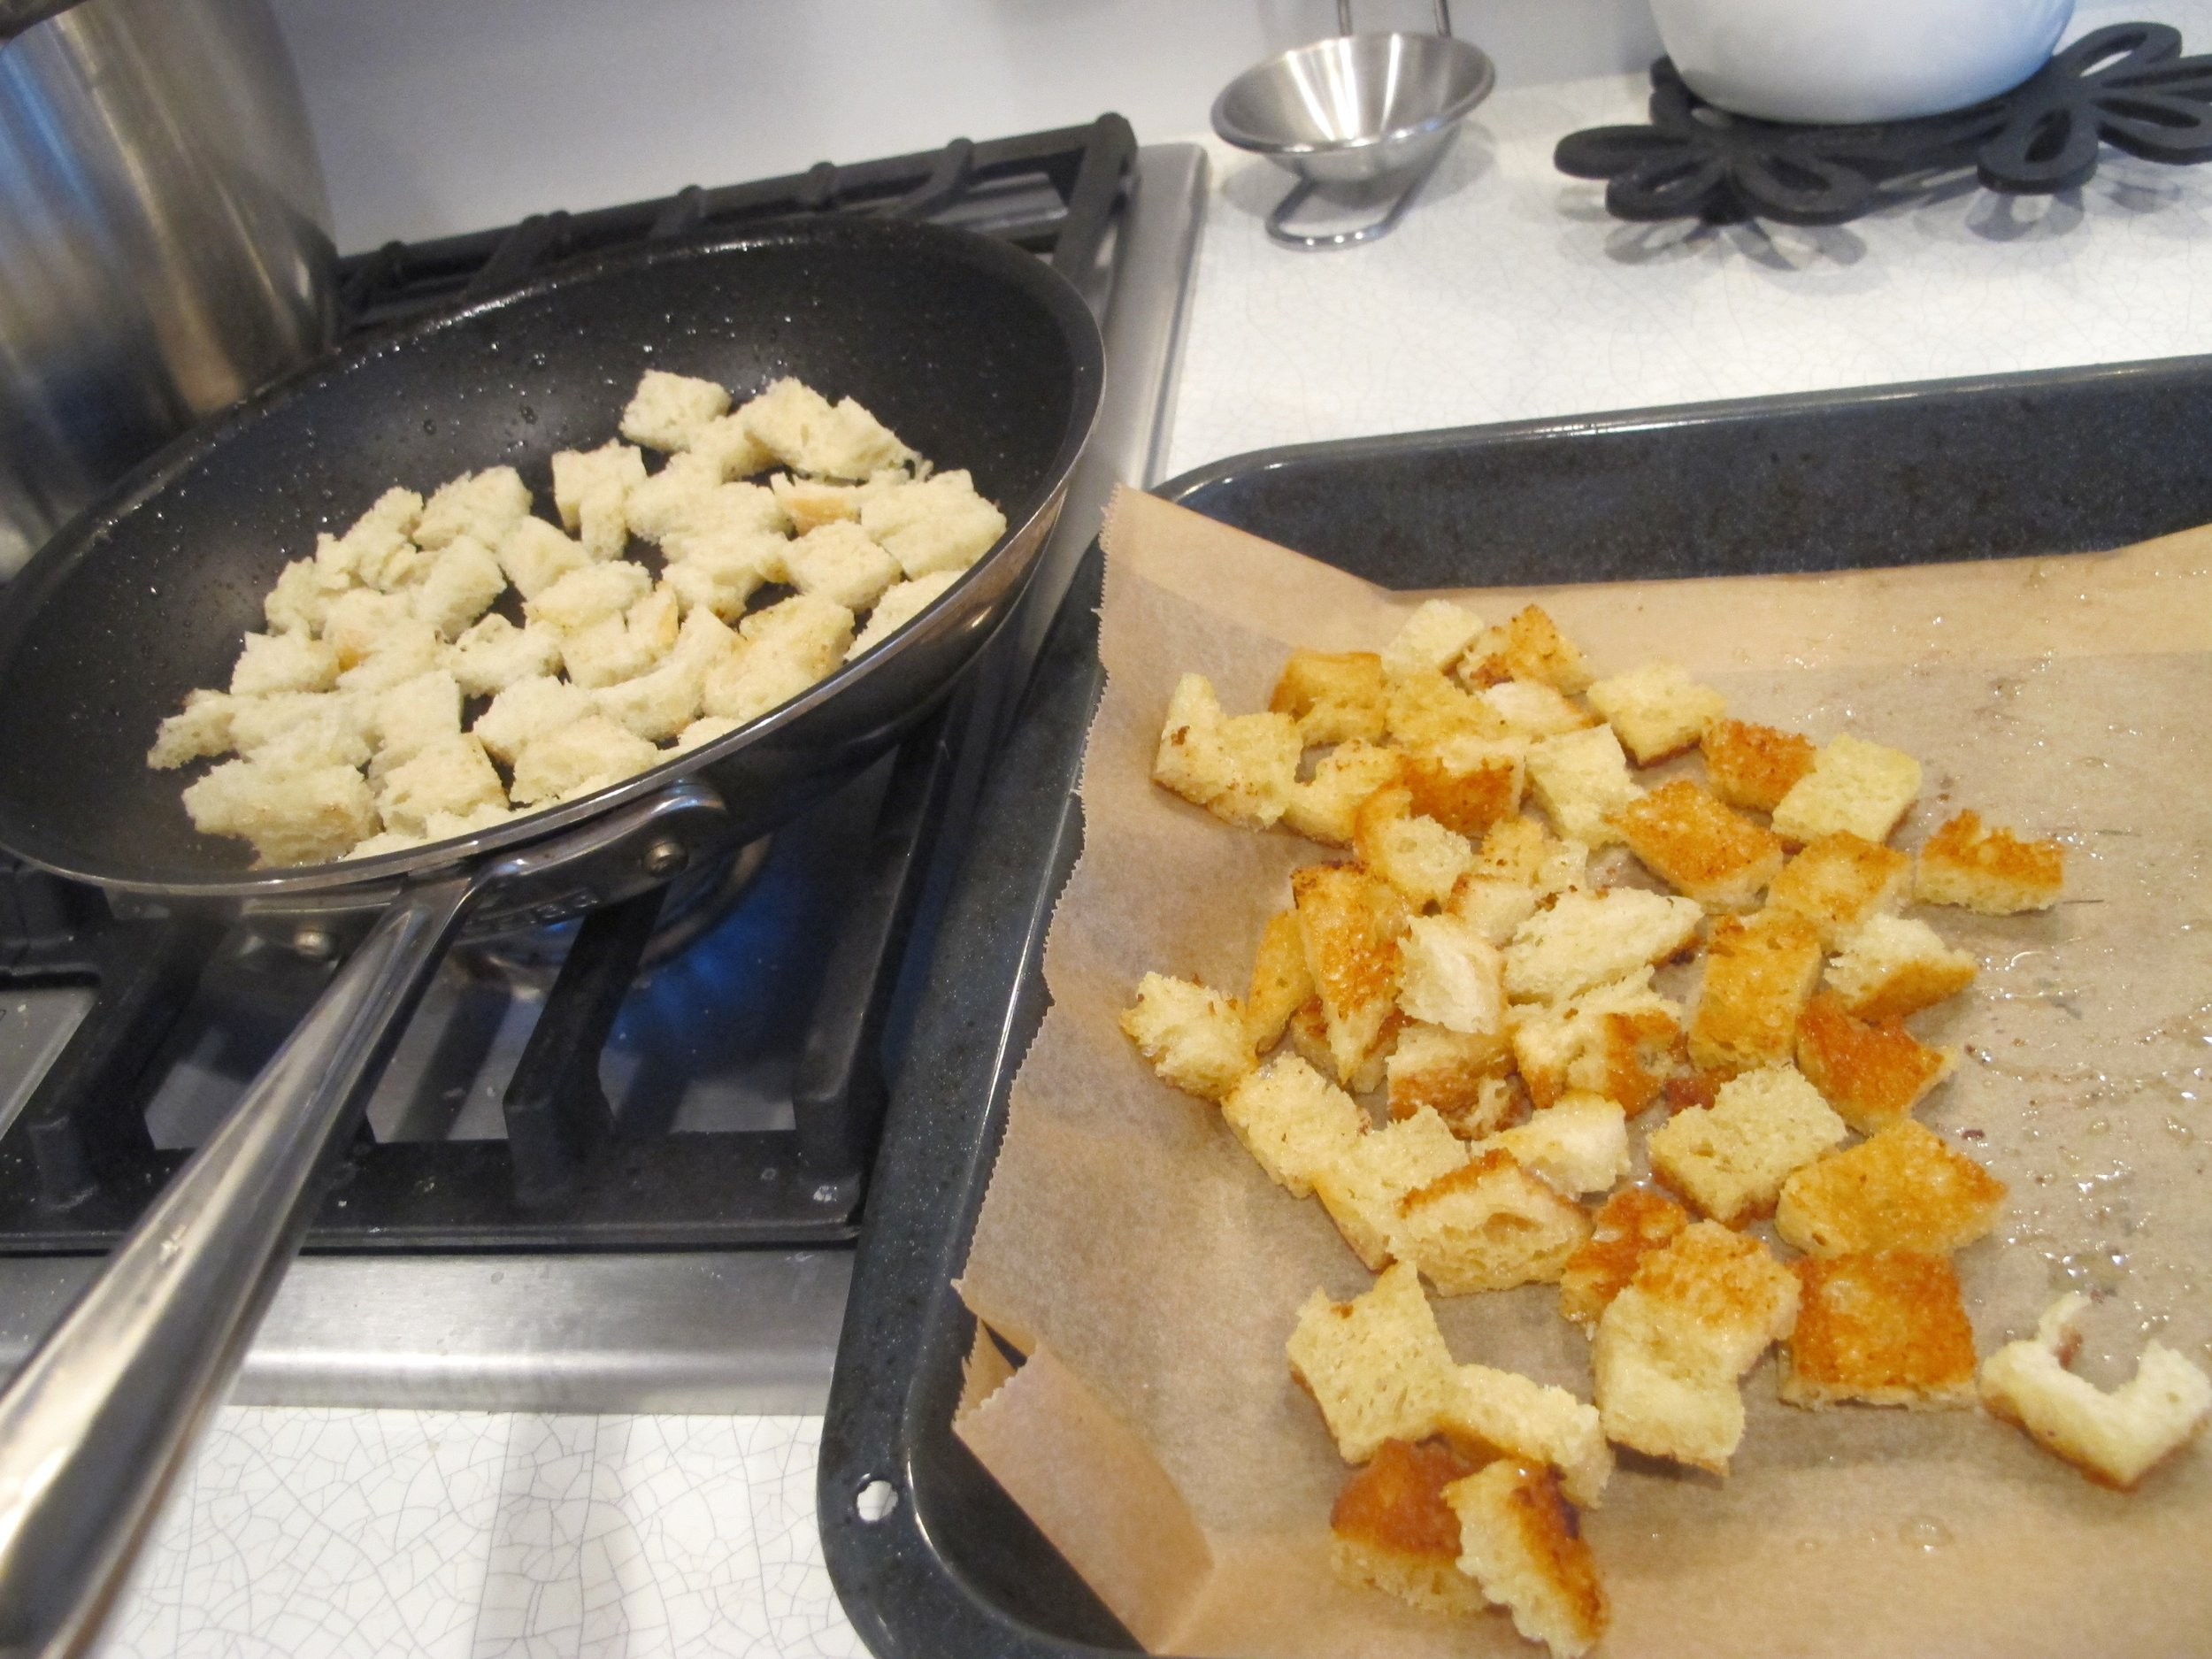 Zucca_al_Forno_Roasted_Pumpkin_with_Cheese-Mushroom_7.JPG